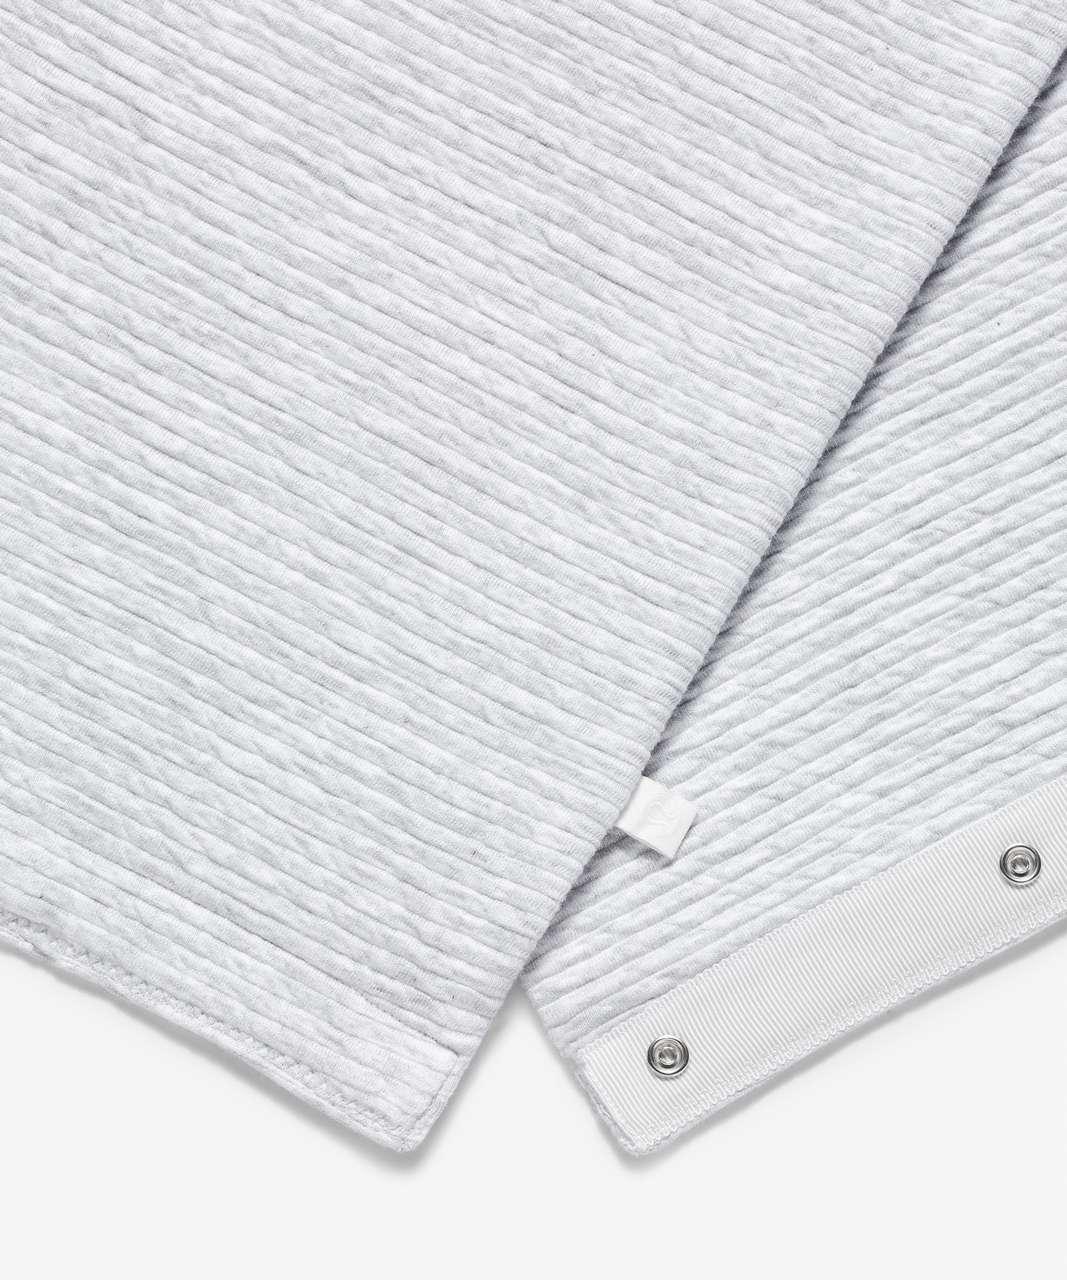 Lululemon Vinyasa Skinny Scarf - Heathered Core Ultra Light Grey